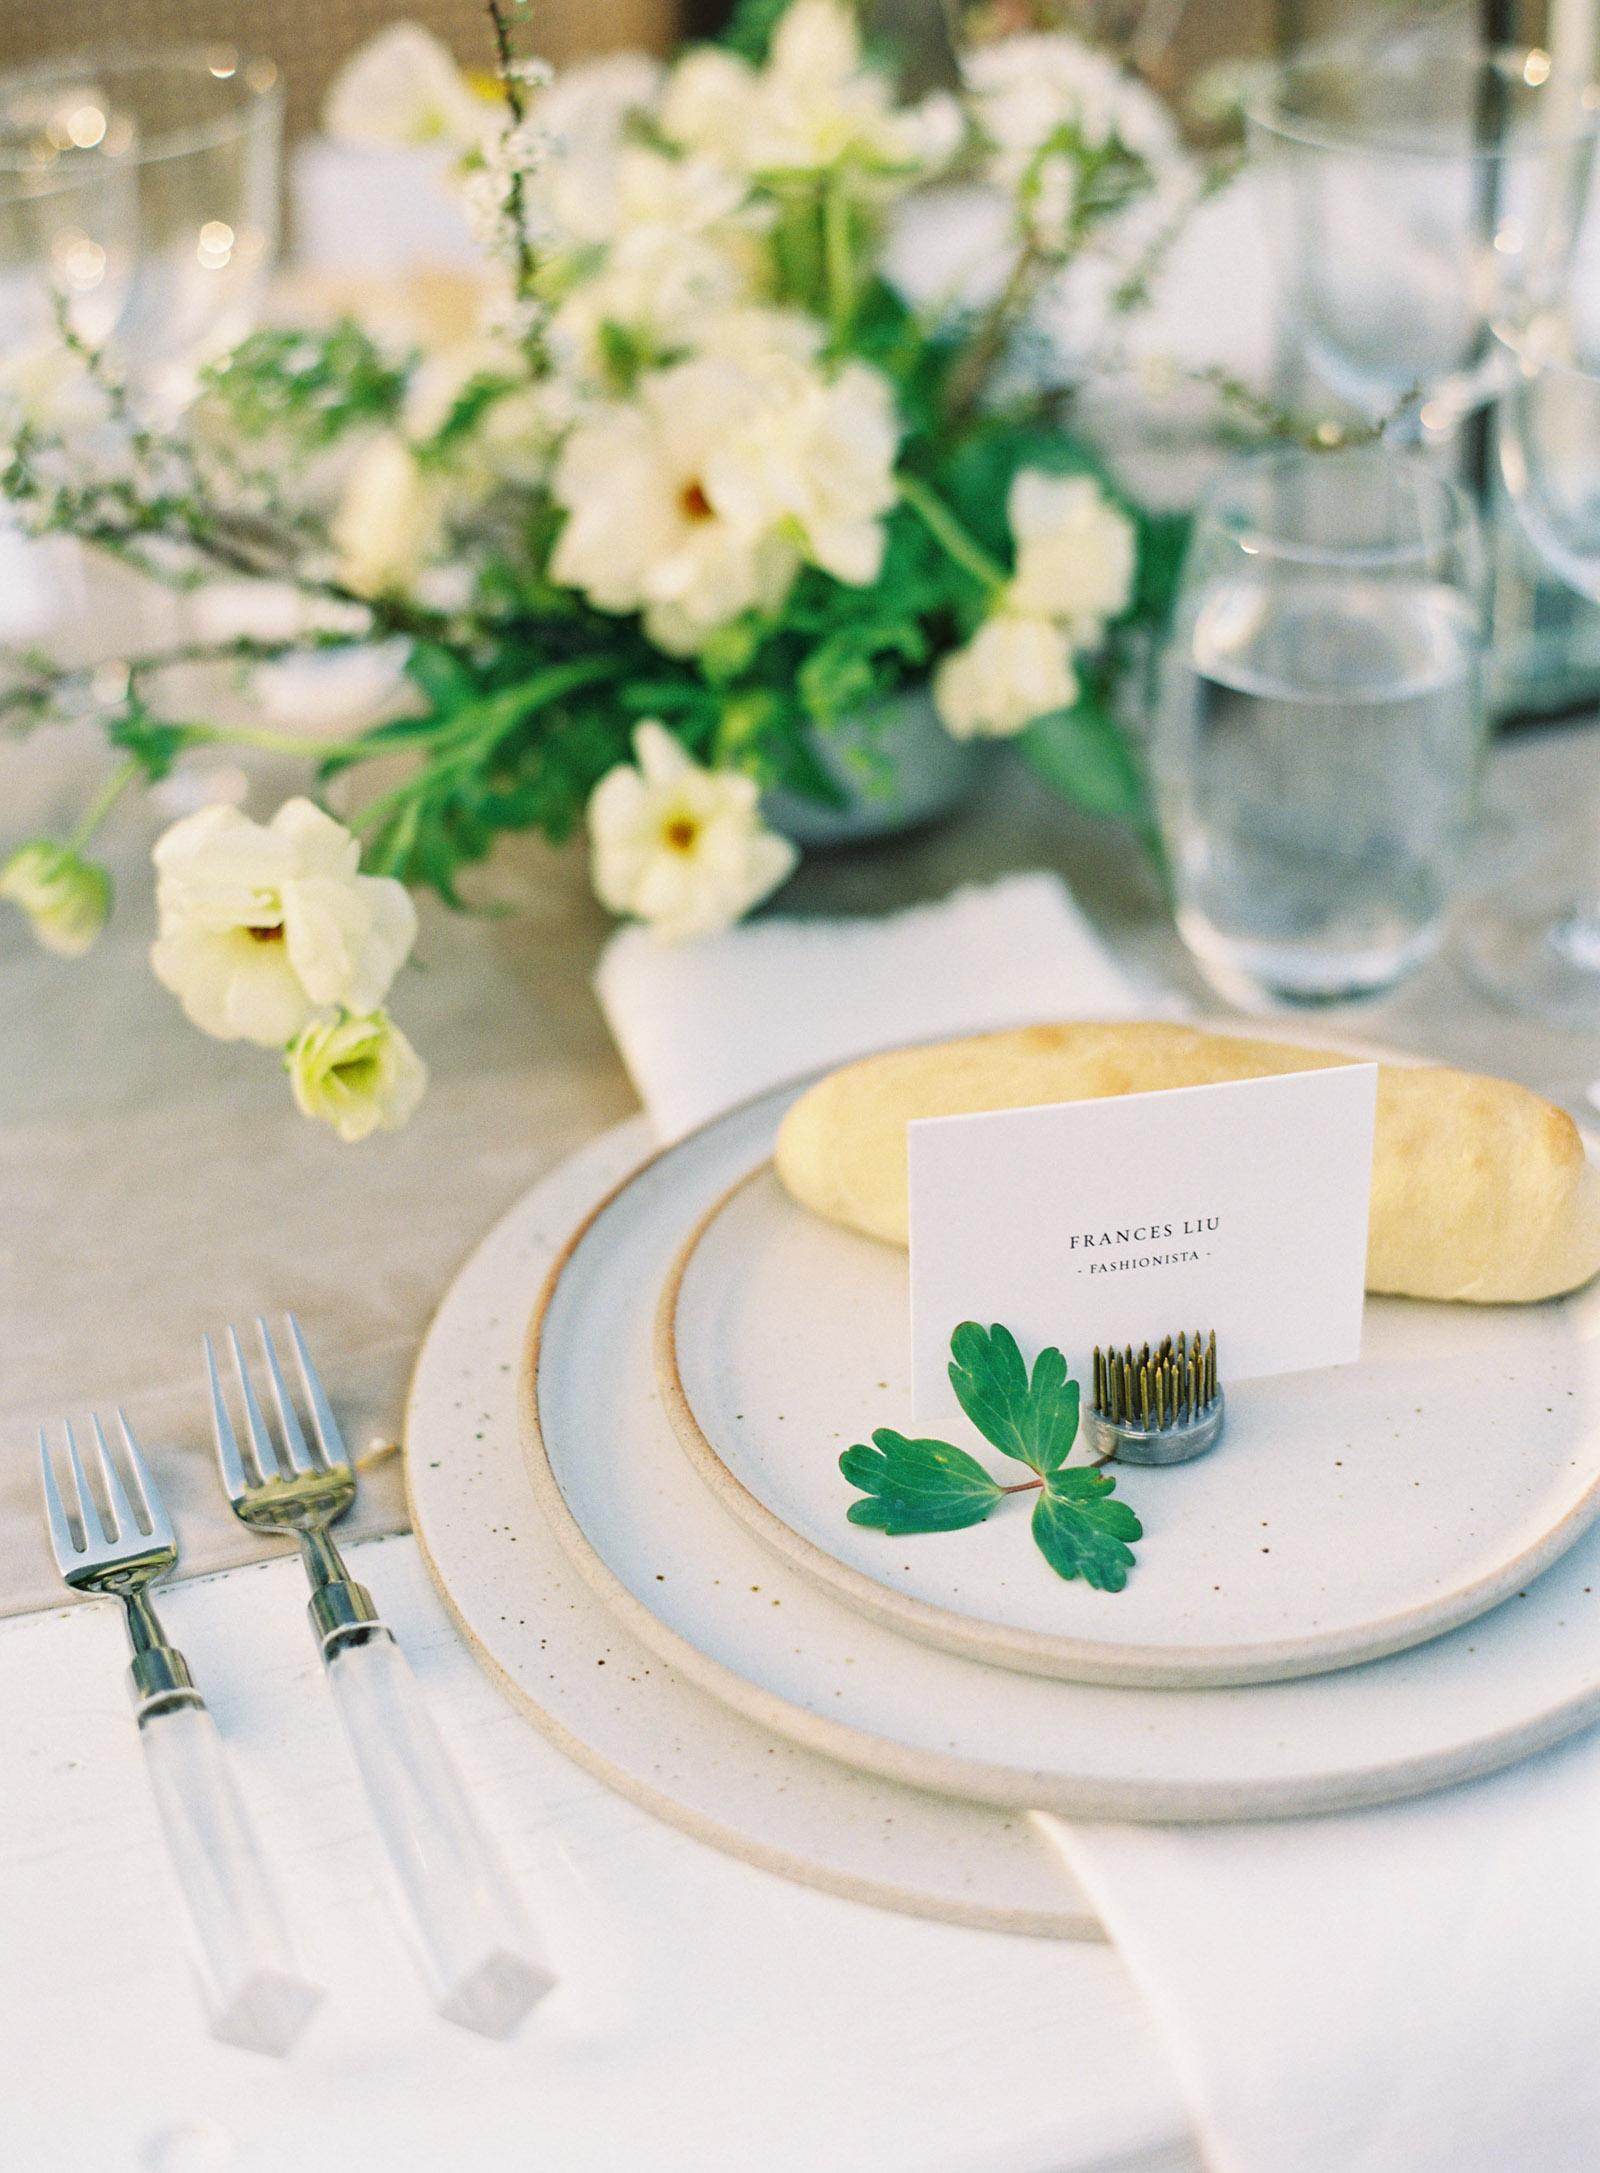 VB-Web-141-Jen-Huang-Decade-Dinner-Selects-35-Jen-Huang-006300-R2-003.jpg